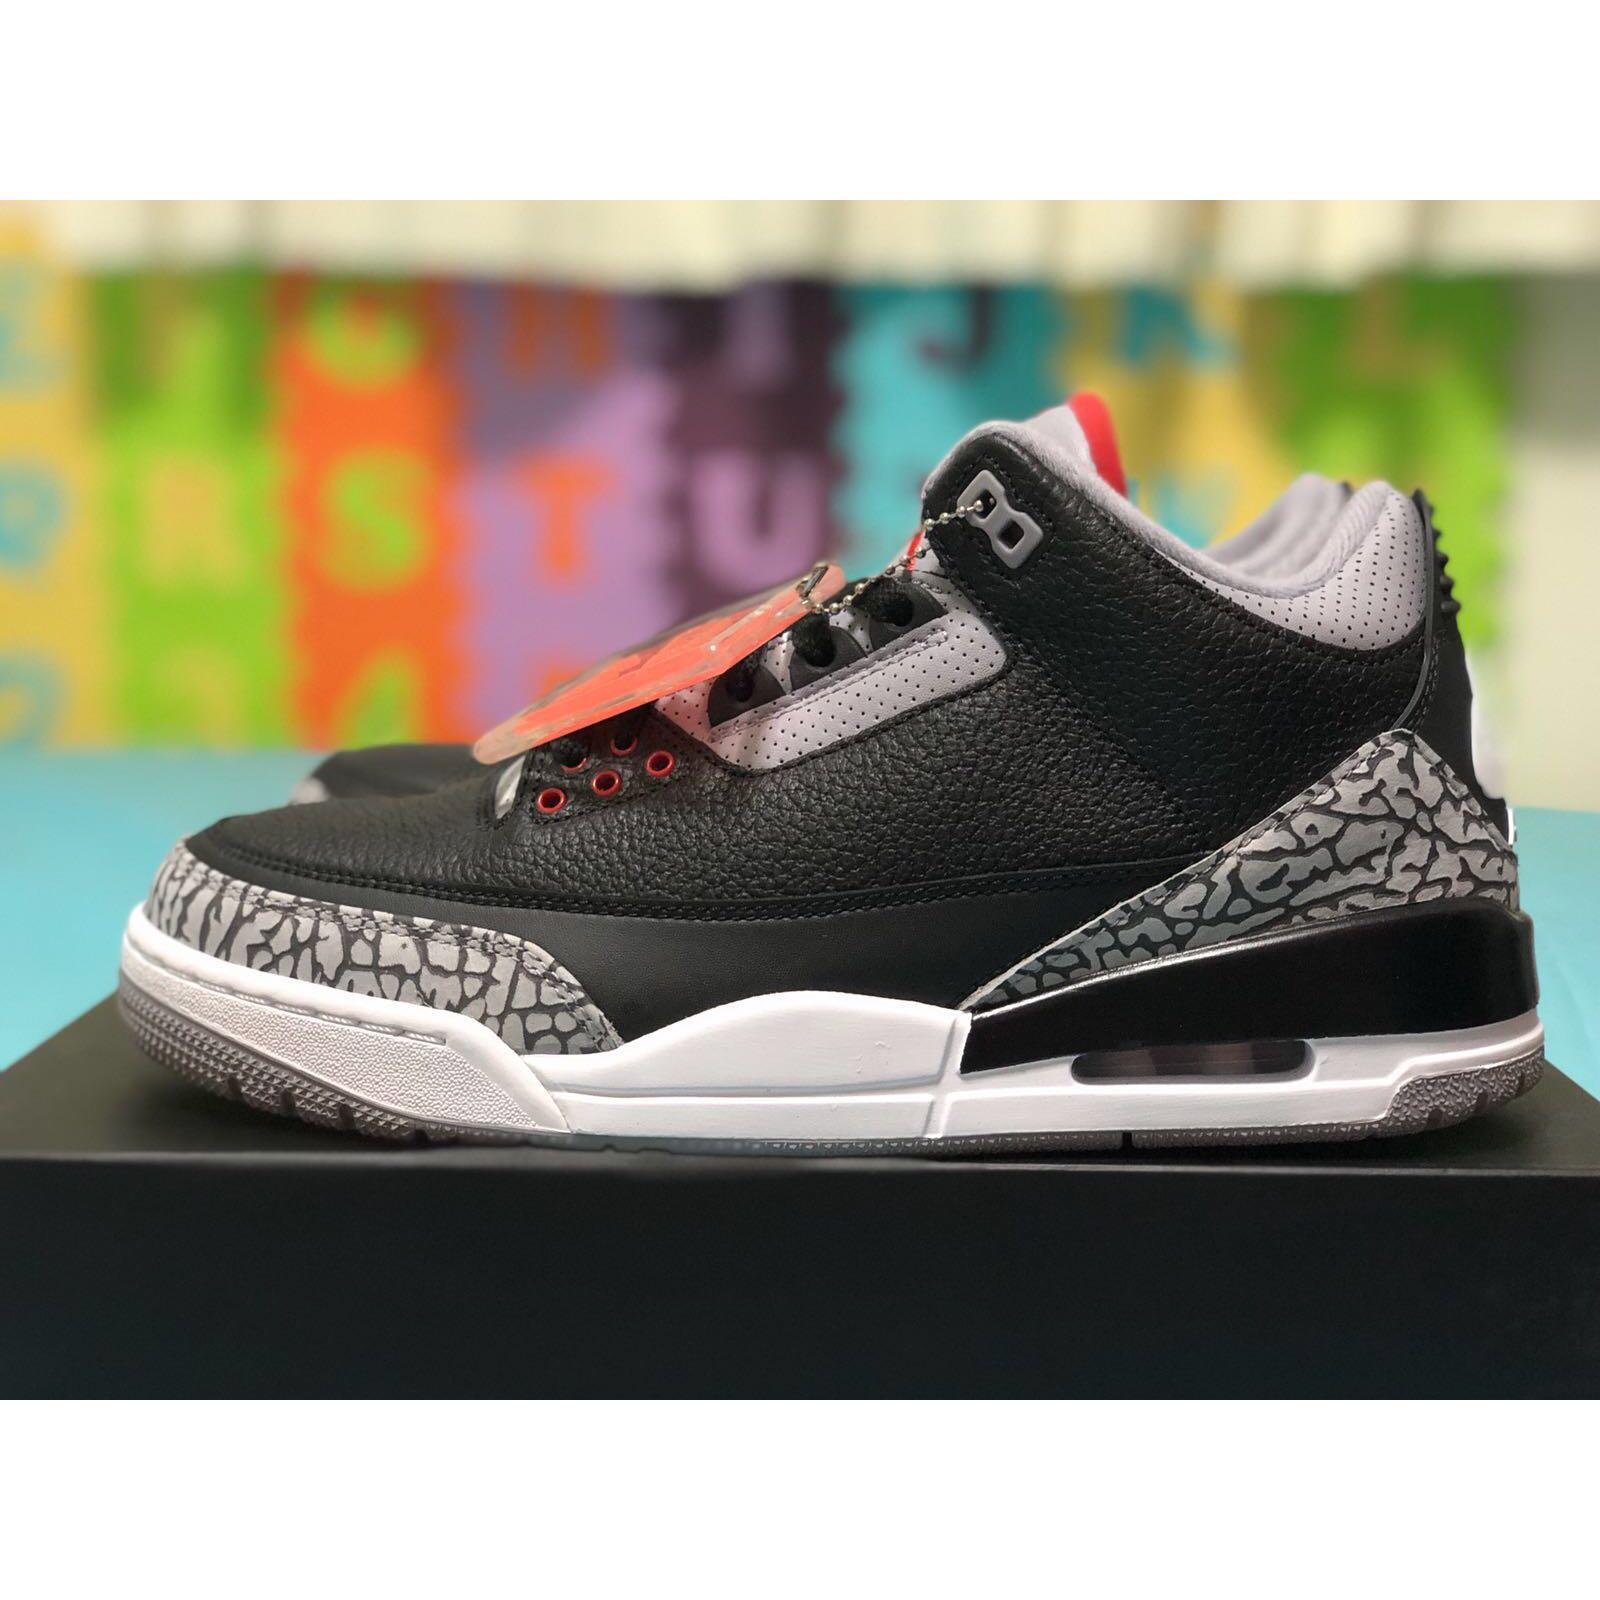 1d24626c2a2 Air Jordan 3 Black Cement 2018, Men's Fashion, Footwear, Sneakers on ...